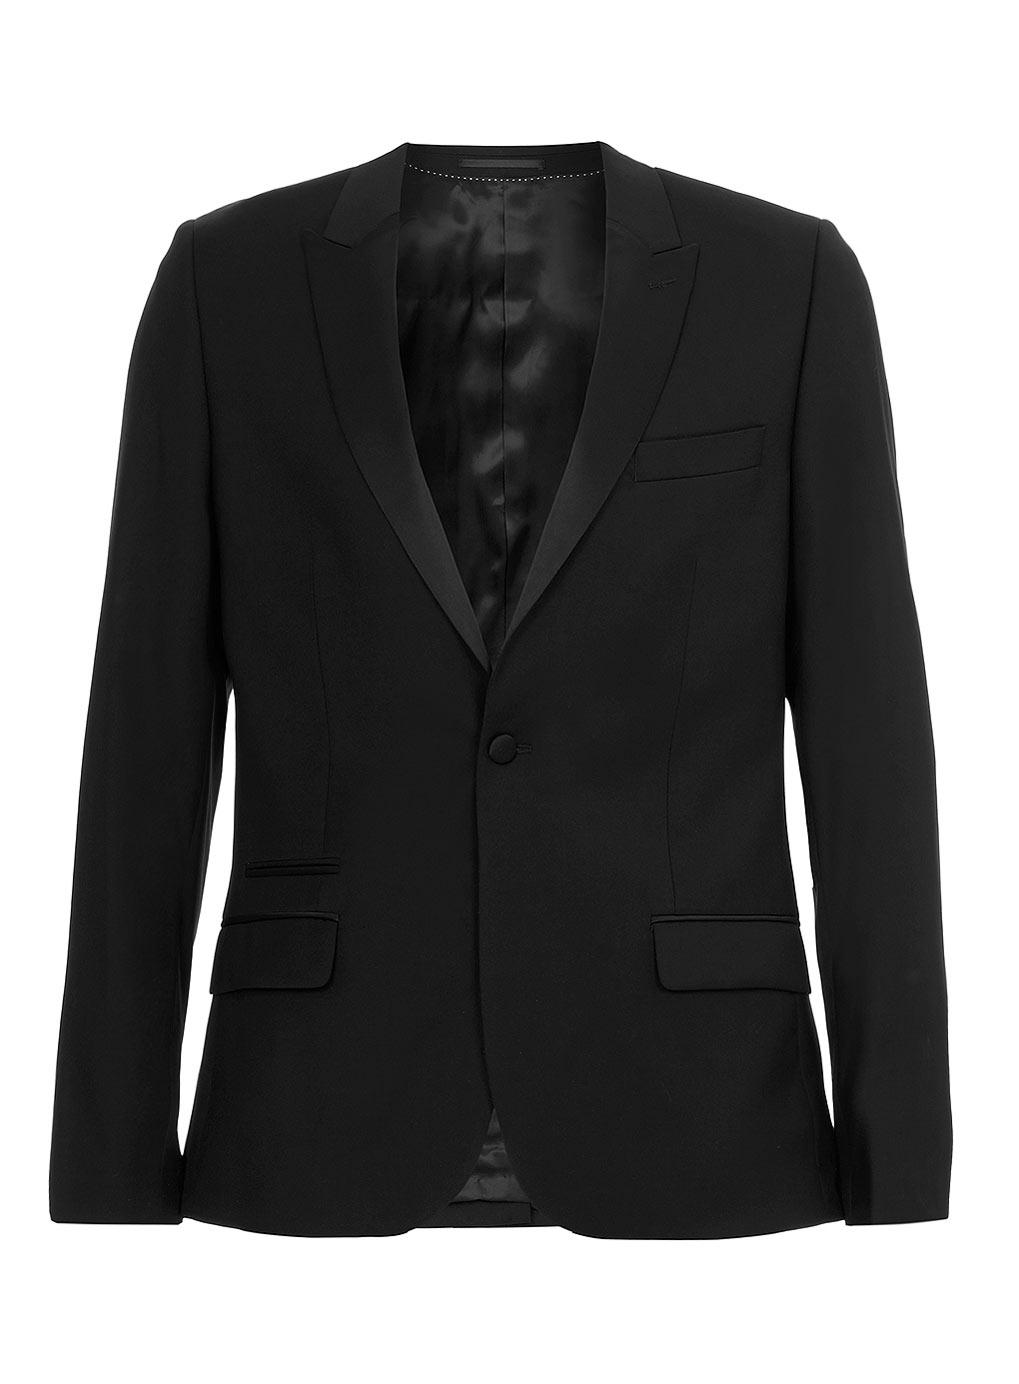 Black Niven Tux Skinny Suit Jacket, $300 at  Topman *